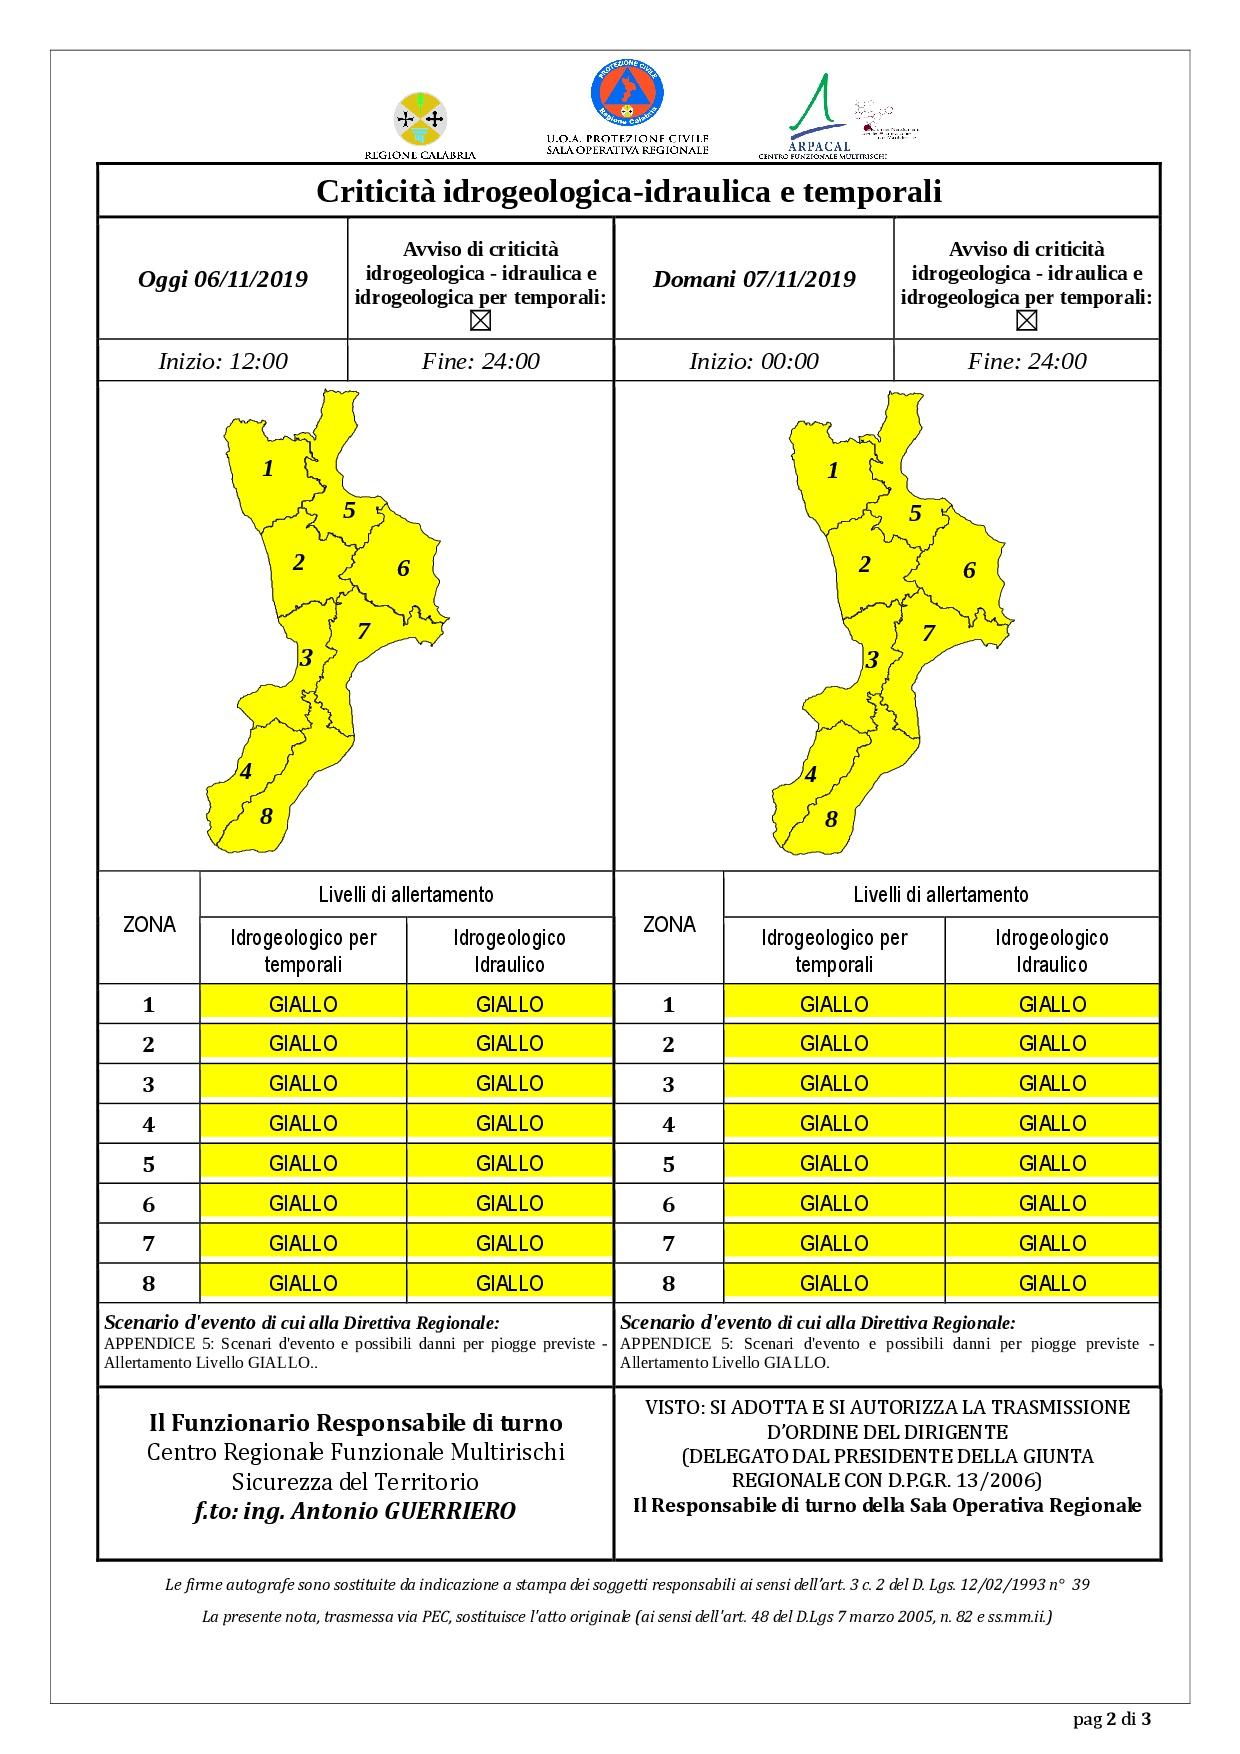 Criticità idrogeologica-idraulica e temporali in Calabria